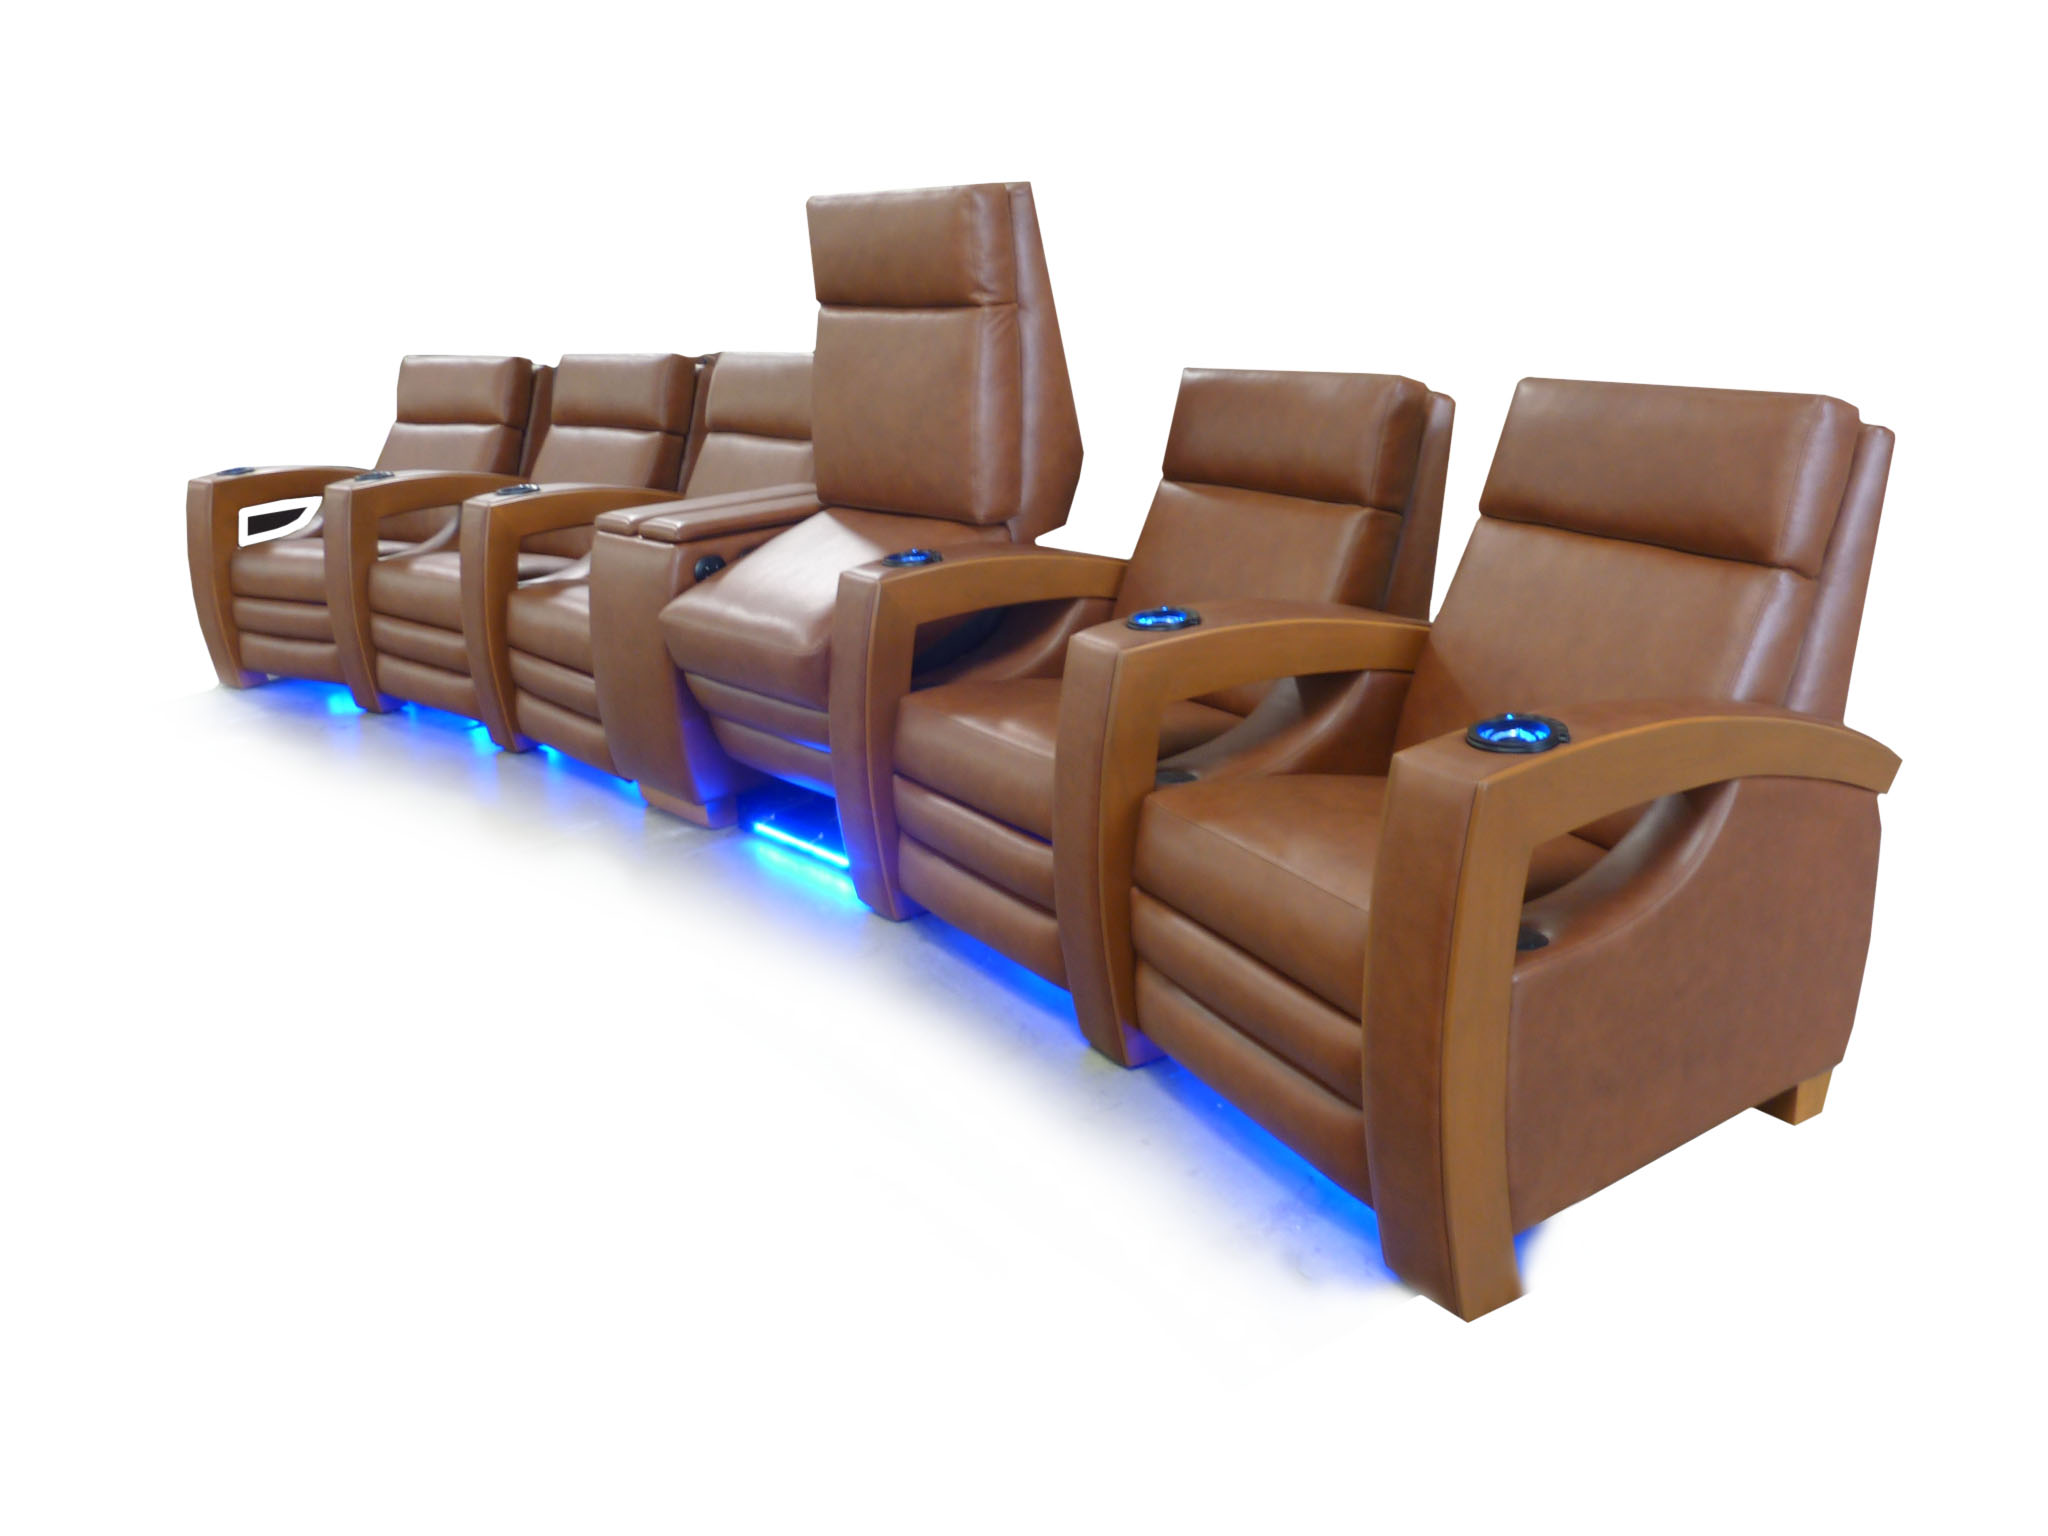 Motorized: 1st Class Tray Tables, Lift Seat, Articulating Headrest & Lumbar Support. Model: Uptown